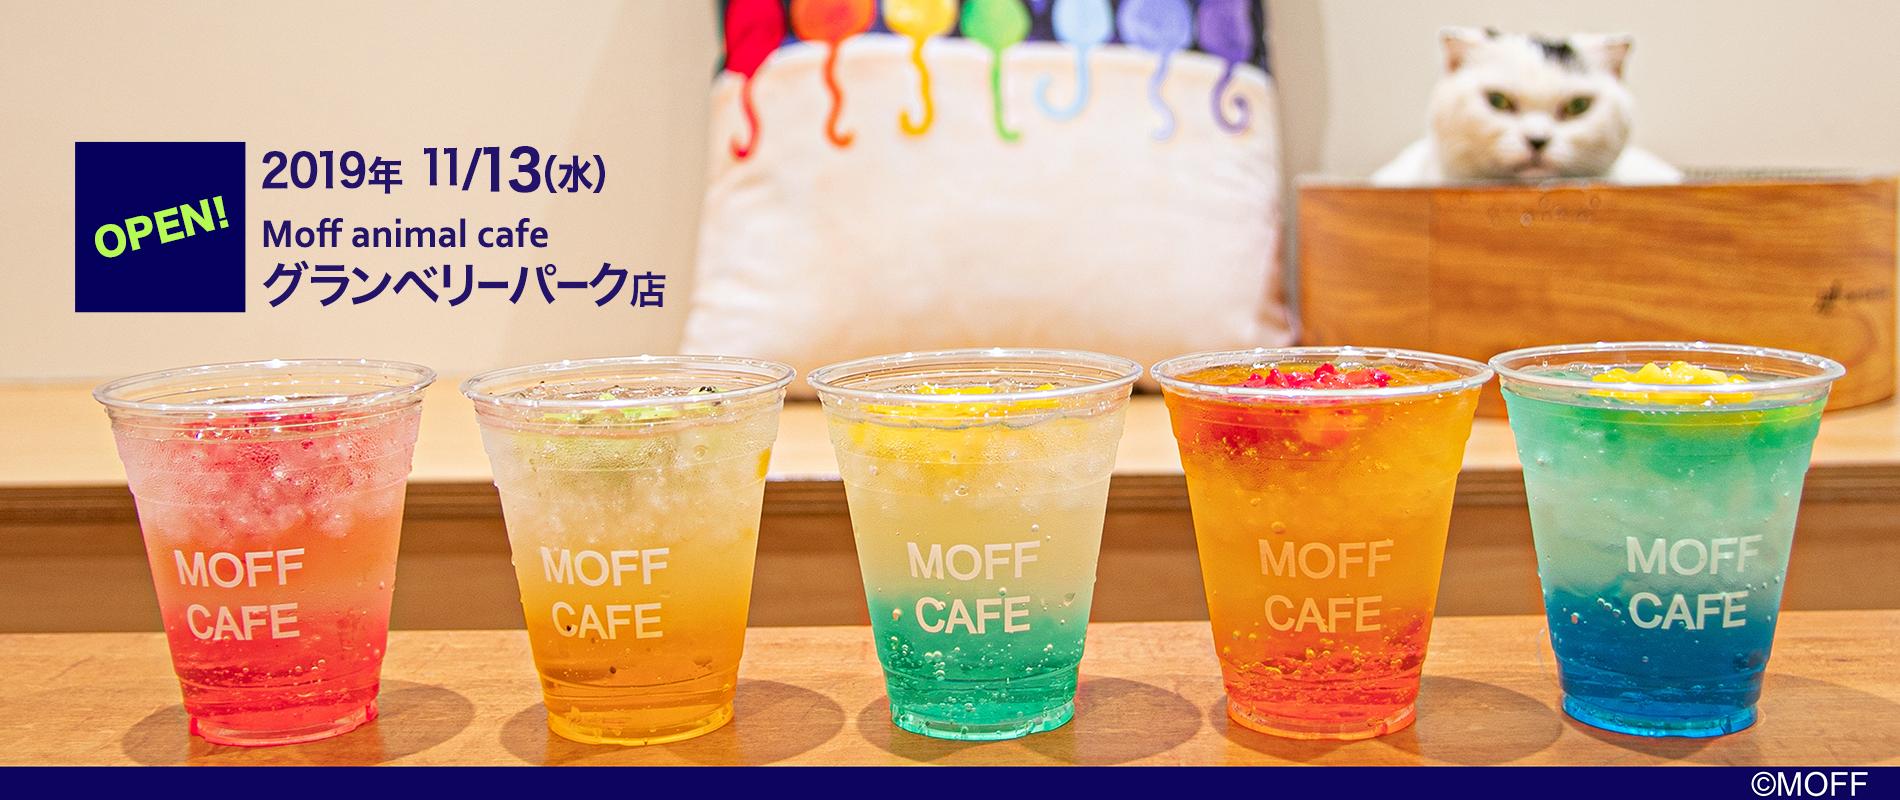 Moff animal cafe グランベリーパーク店 2019年11月13日オープン!